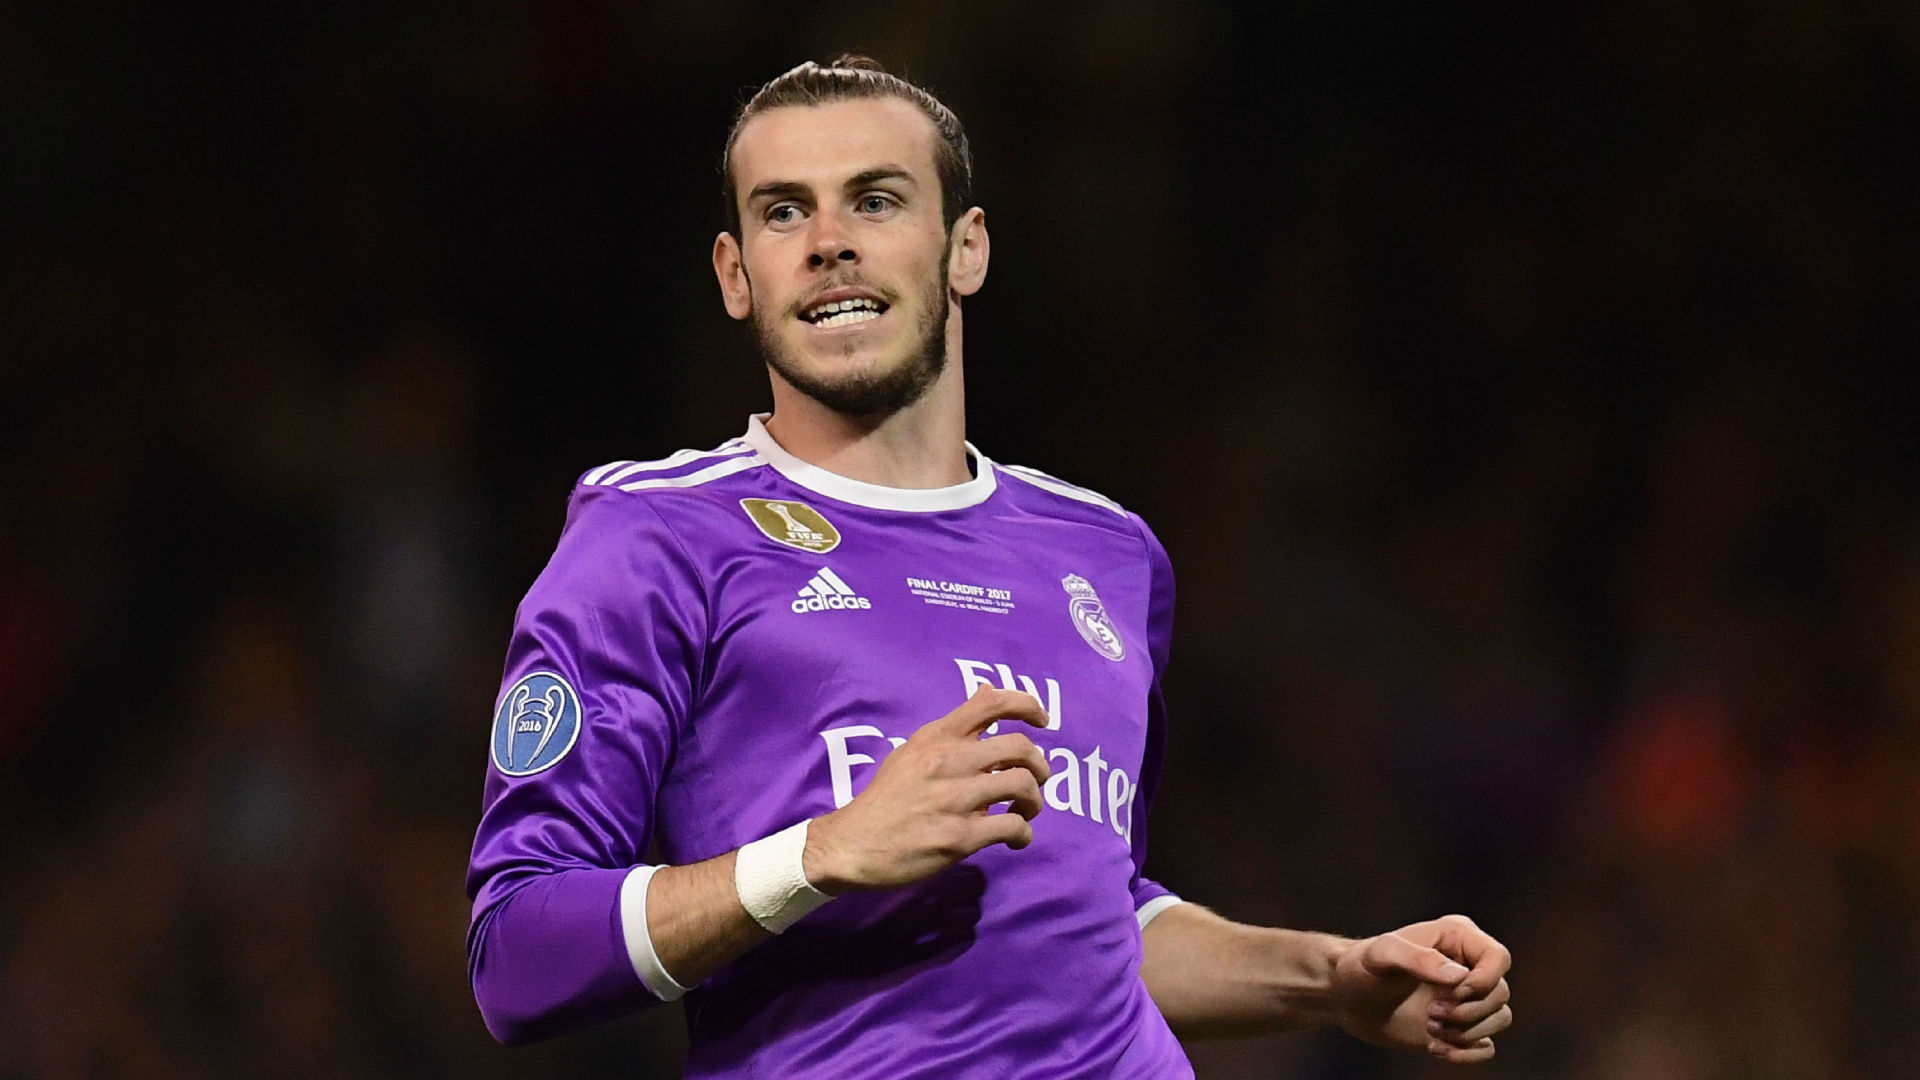 Gareth Bale Real Madrid Champions League 060317